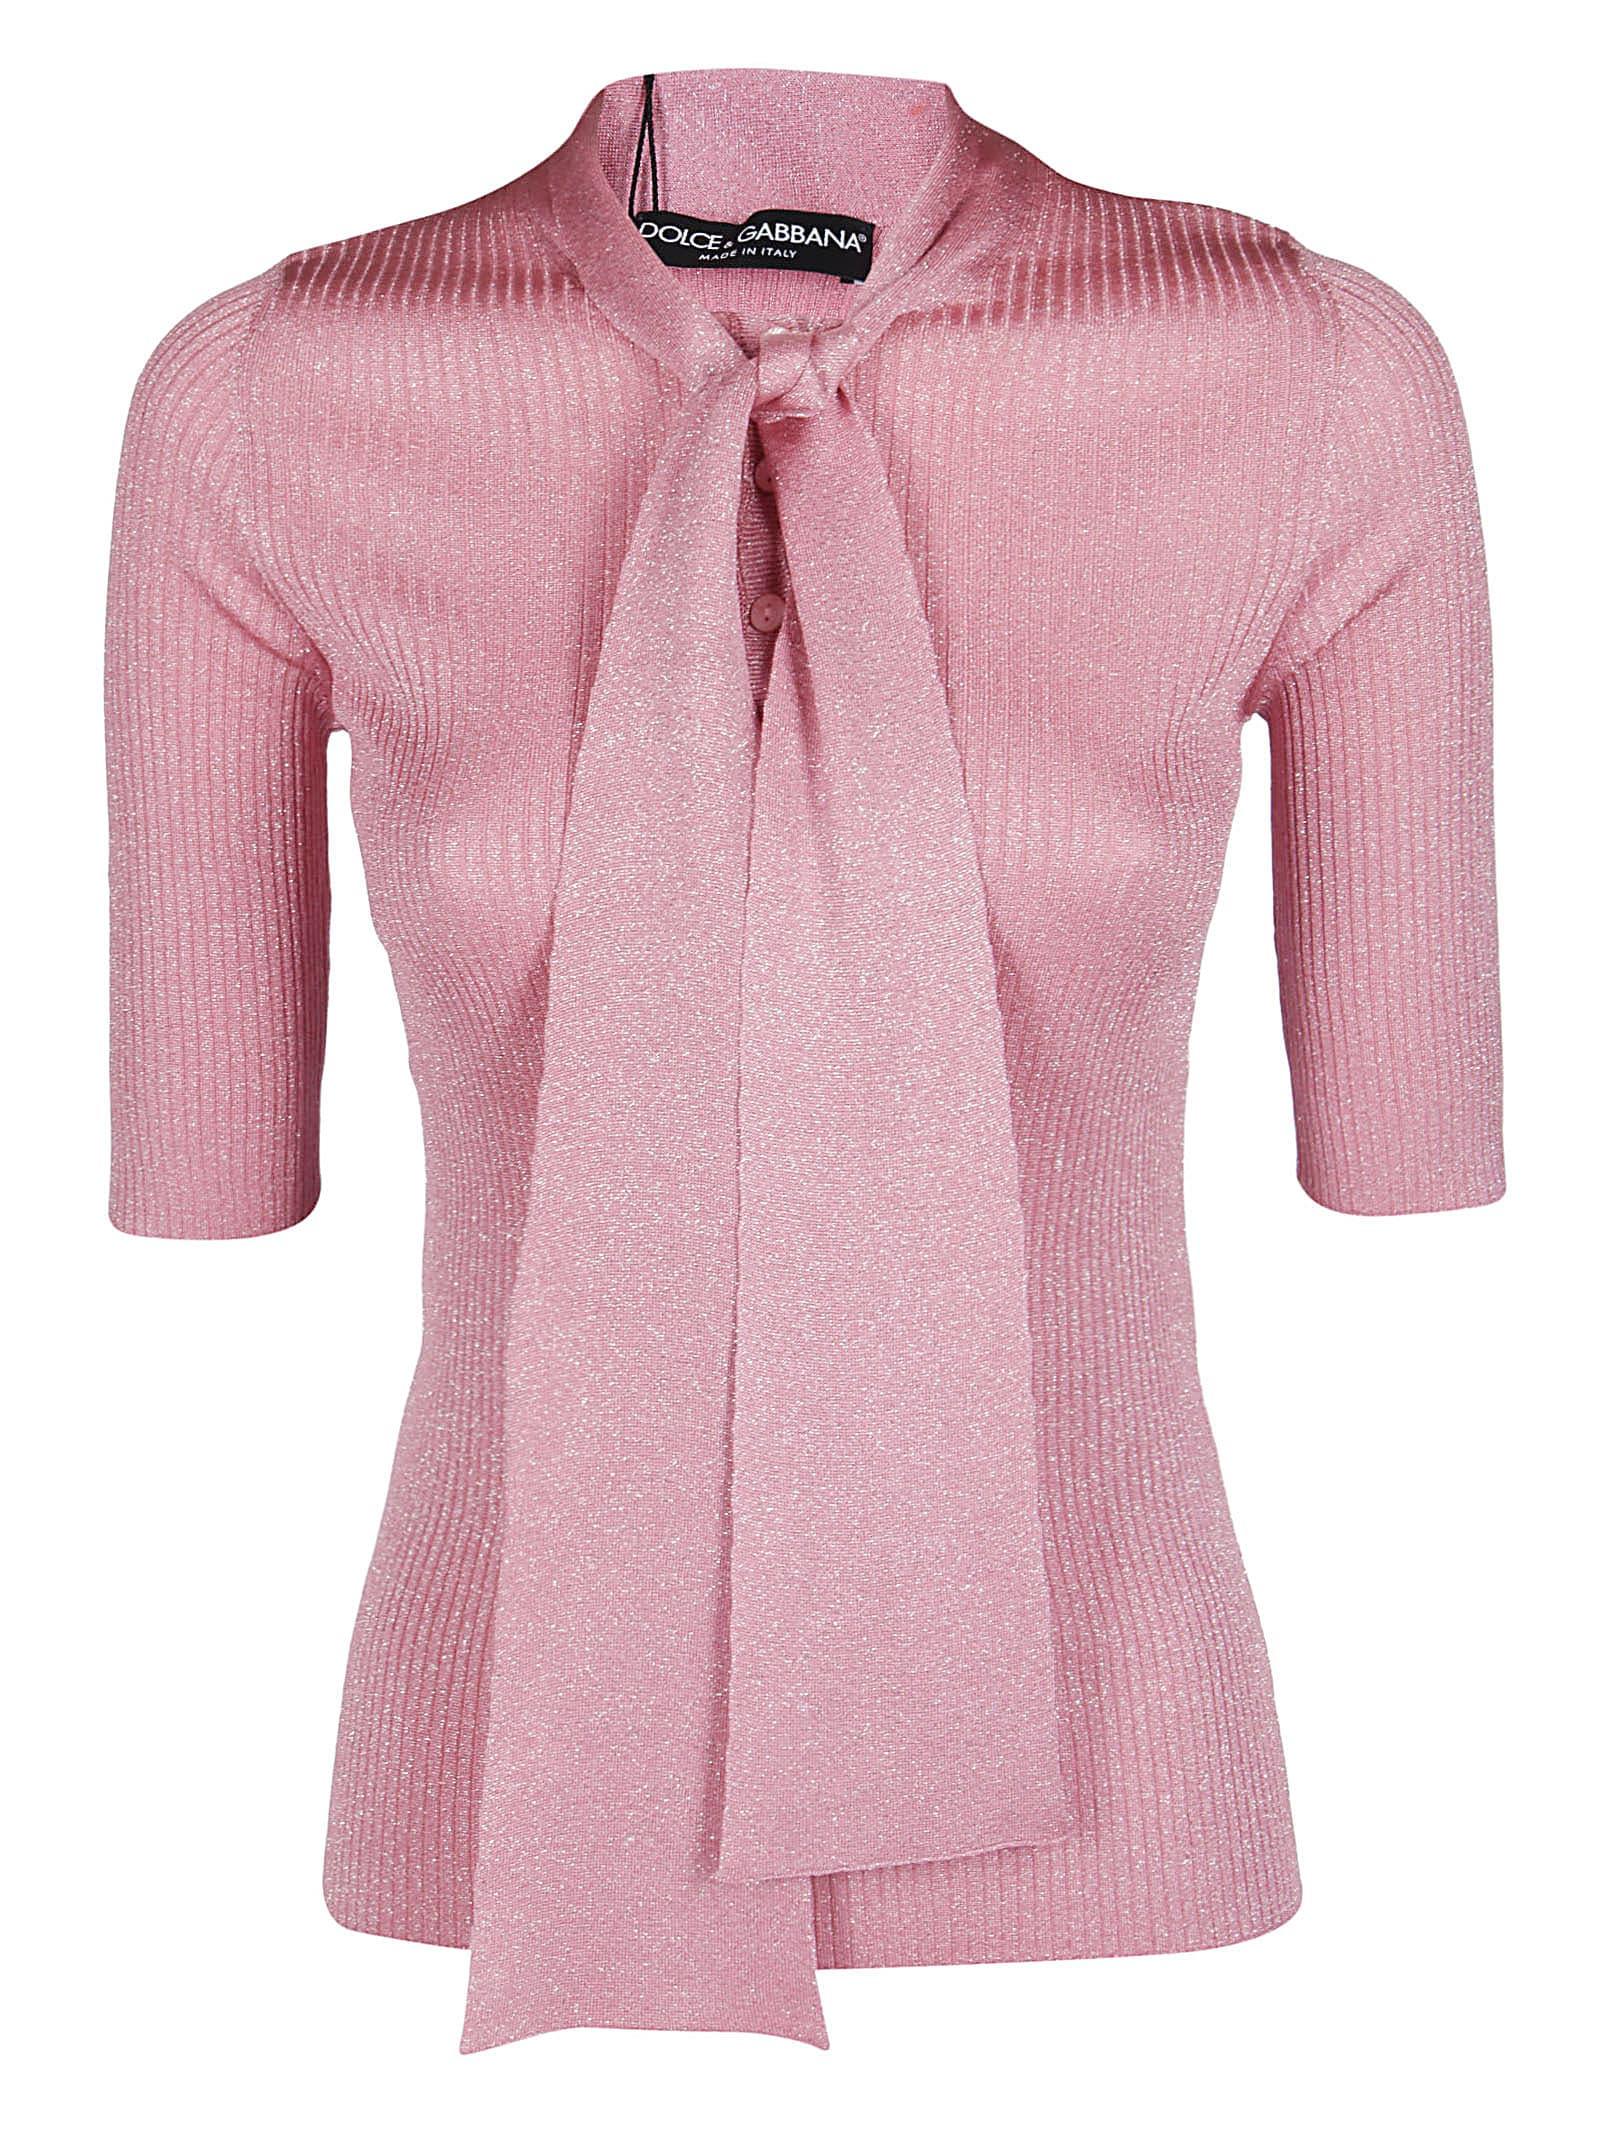 Dolce & Gabbana Pink Viscose Blend Blouse